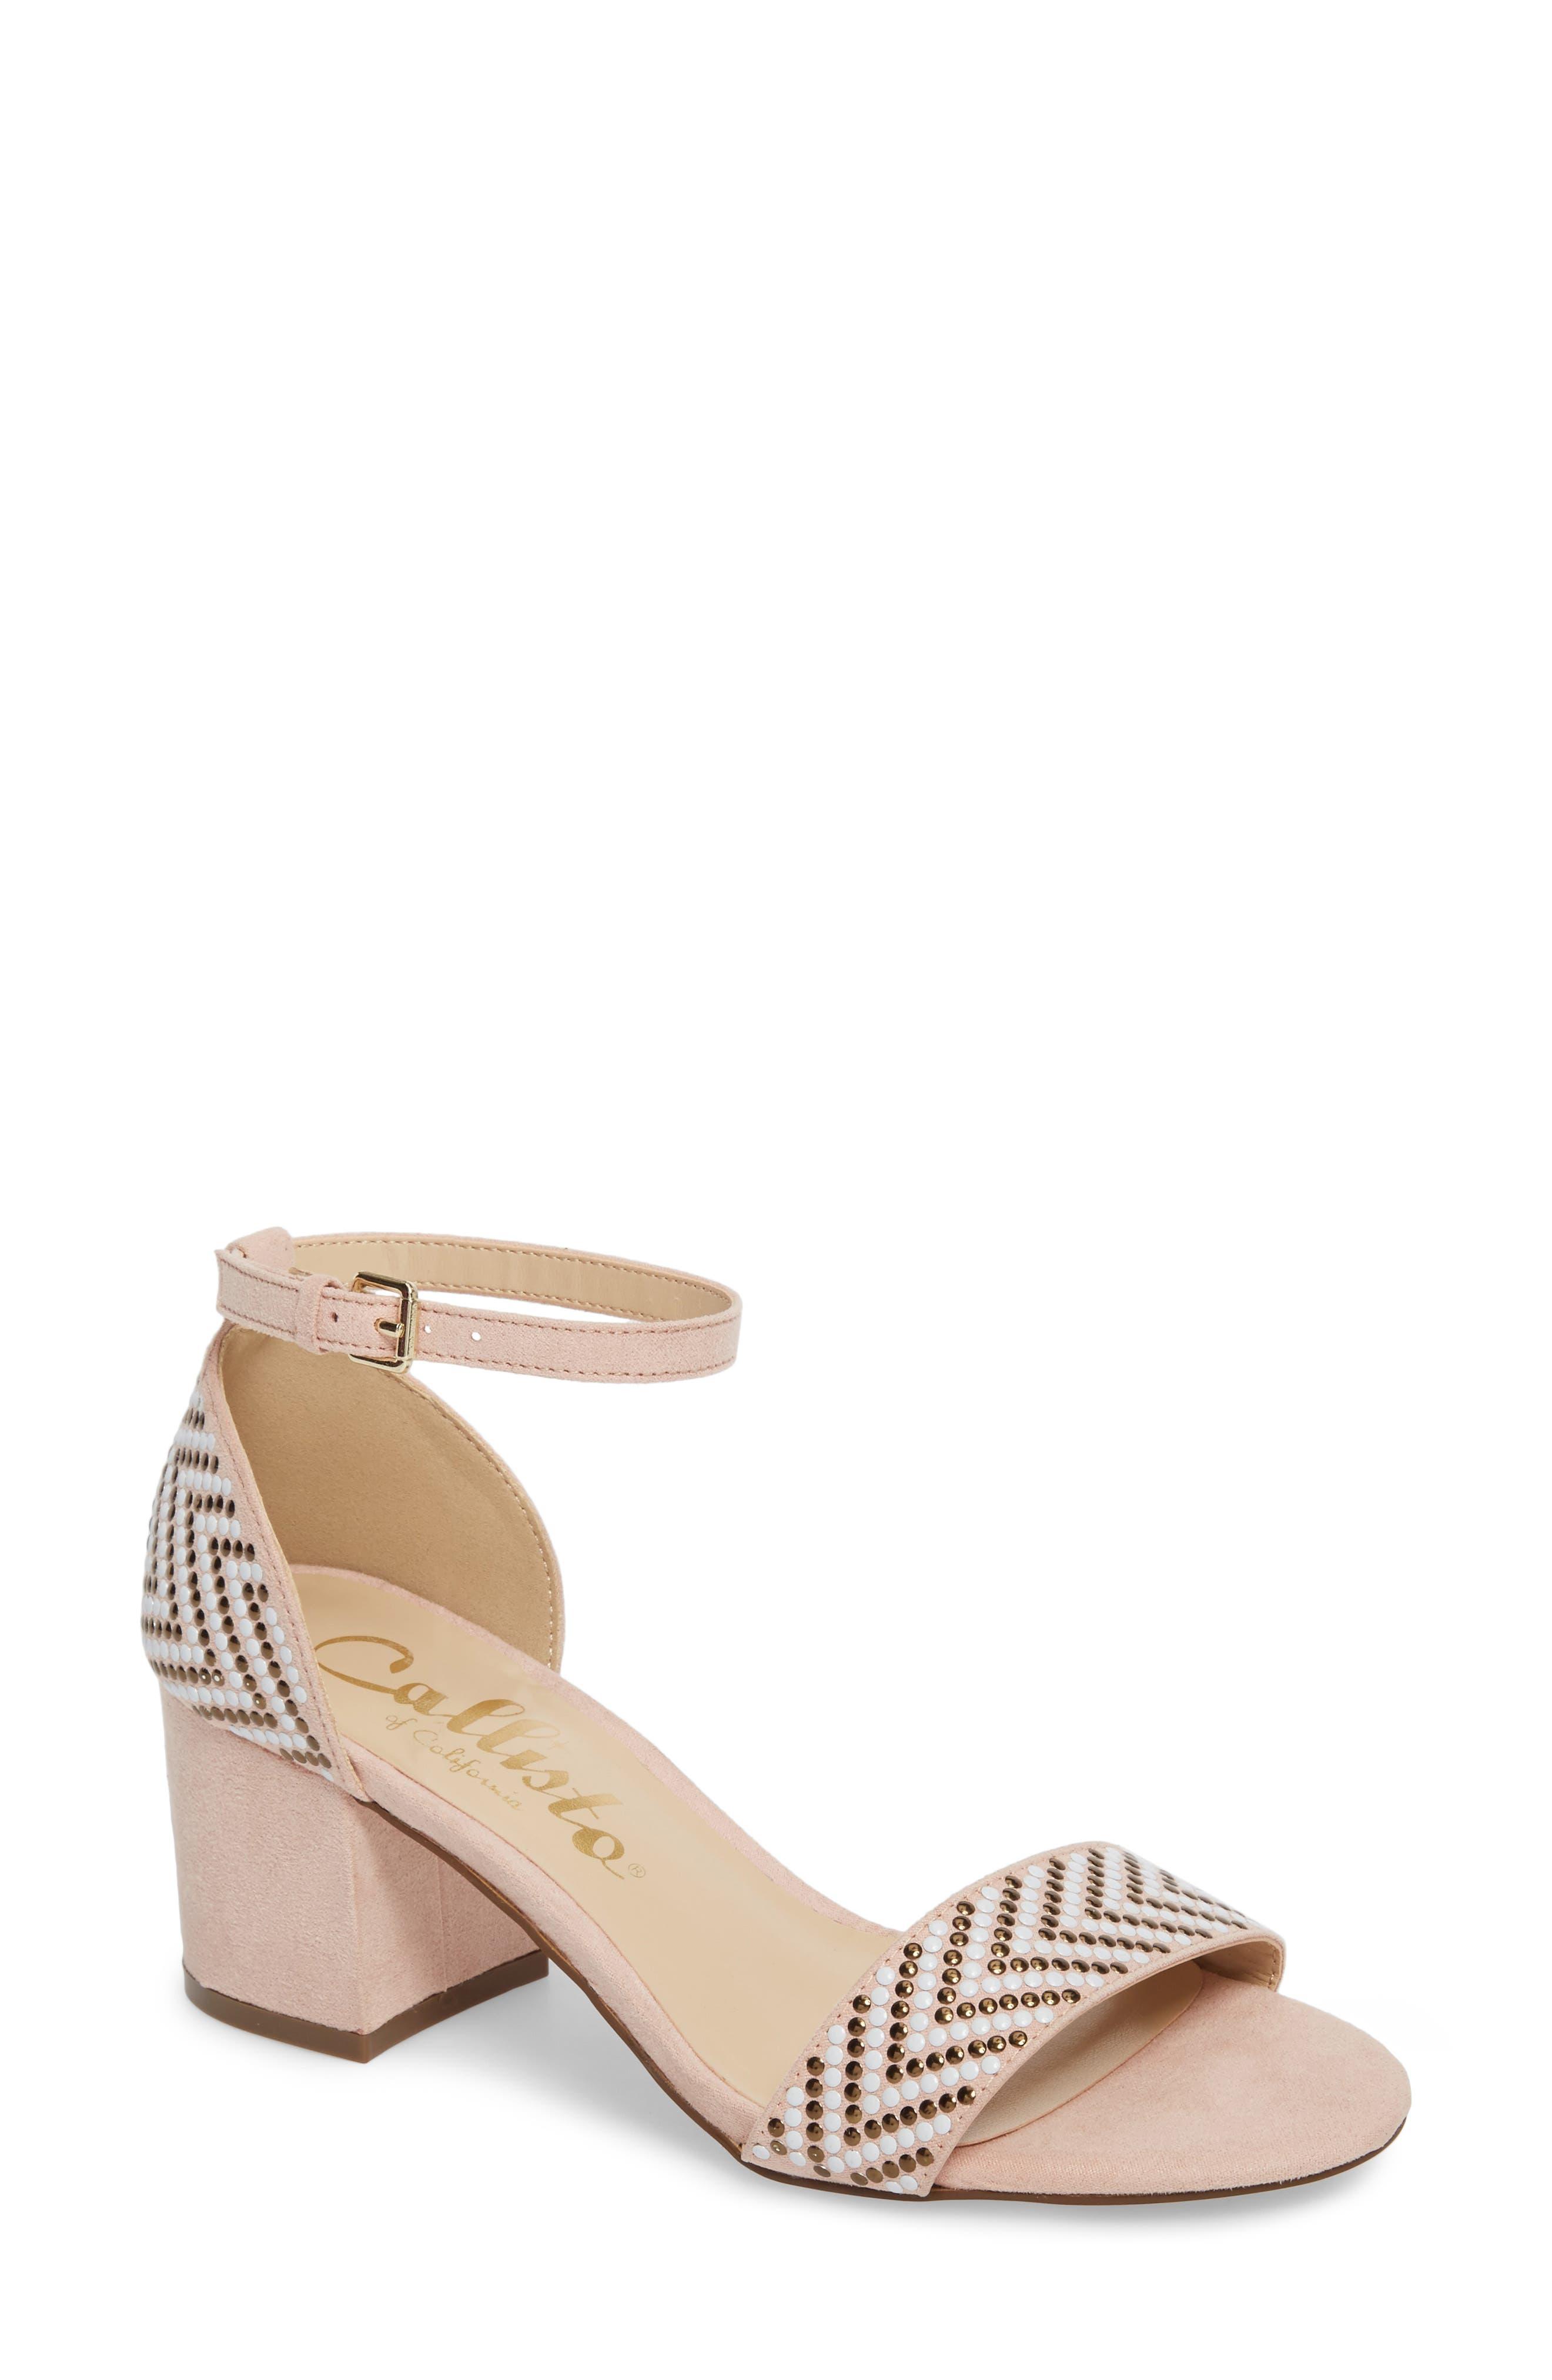 Mercer Ankle Strap Sandal,                         Main,                         color, 650